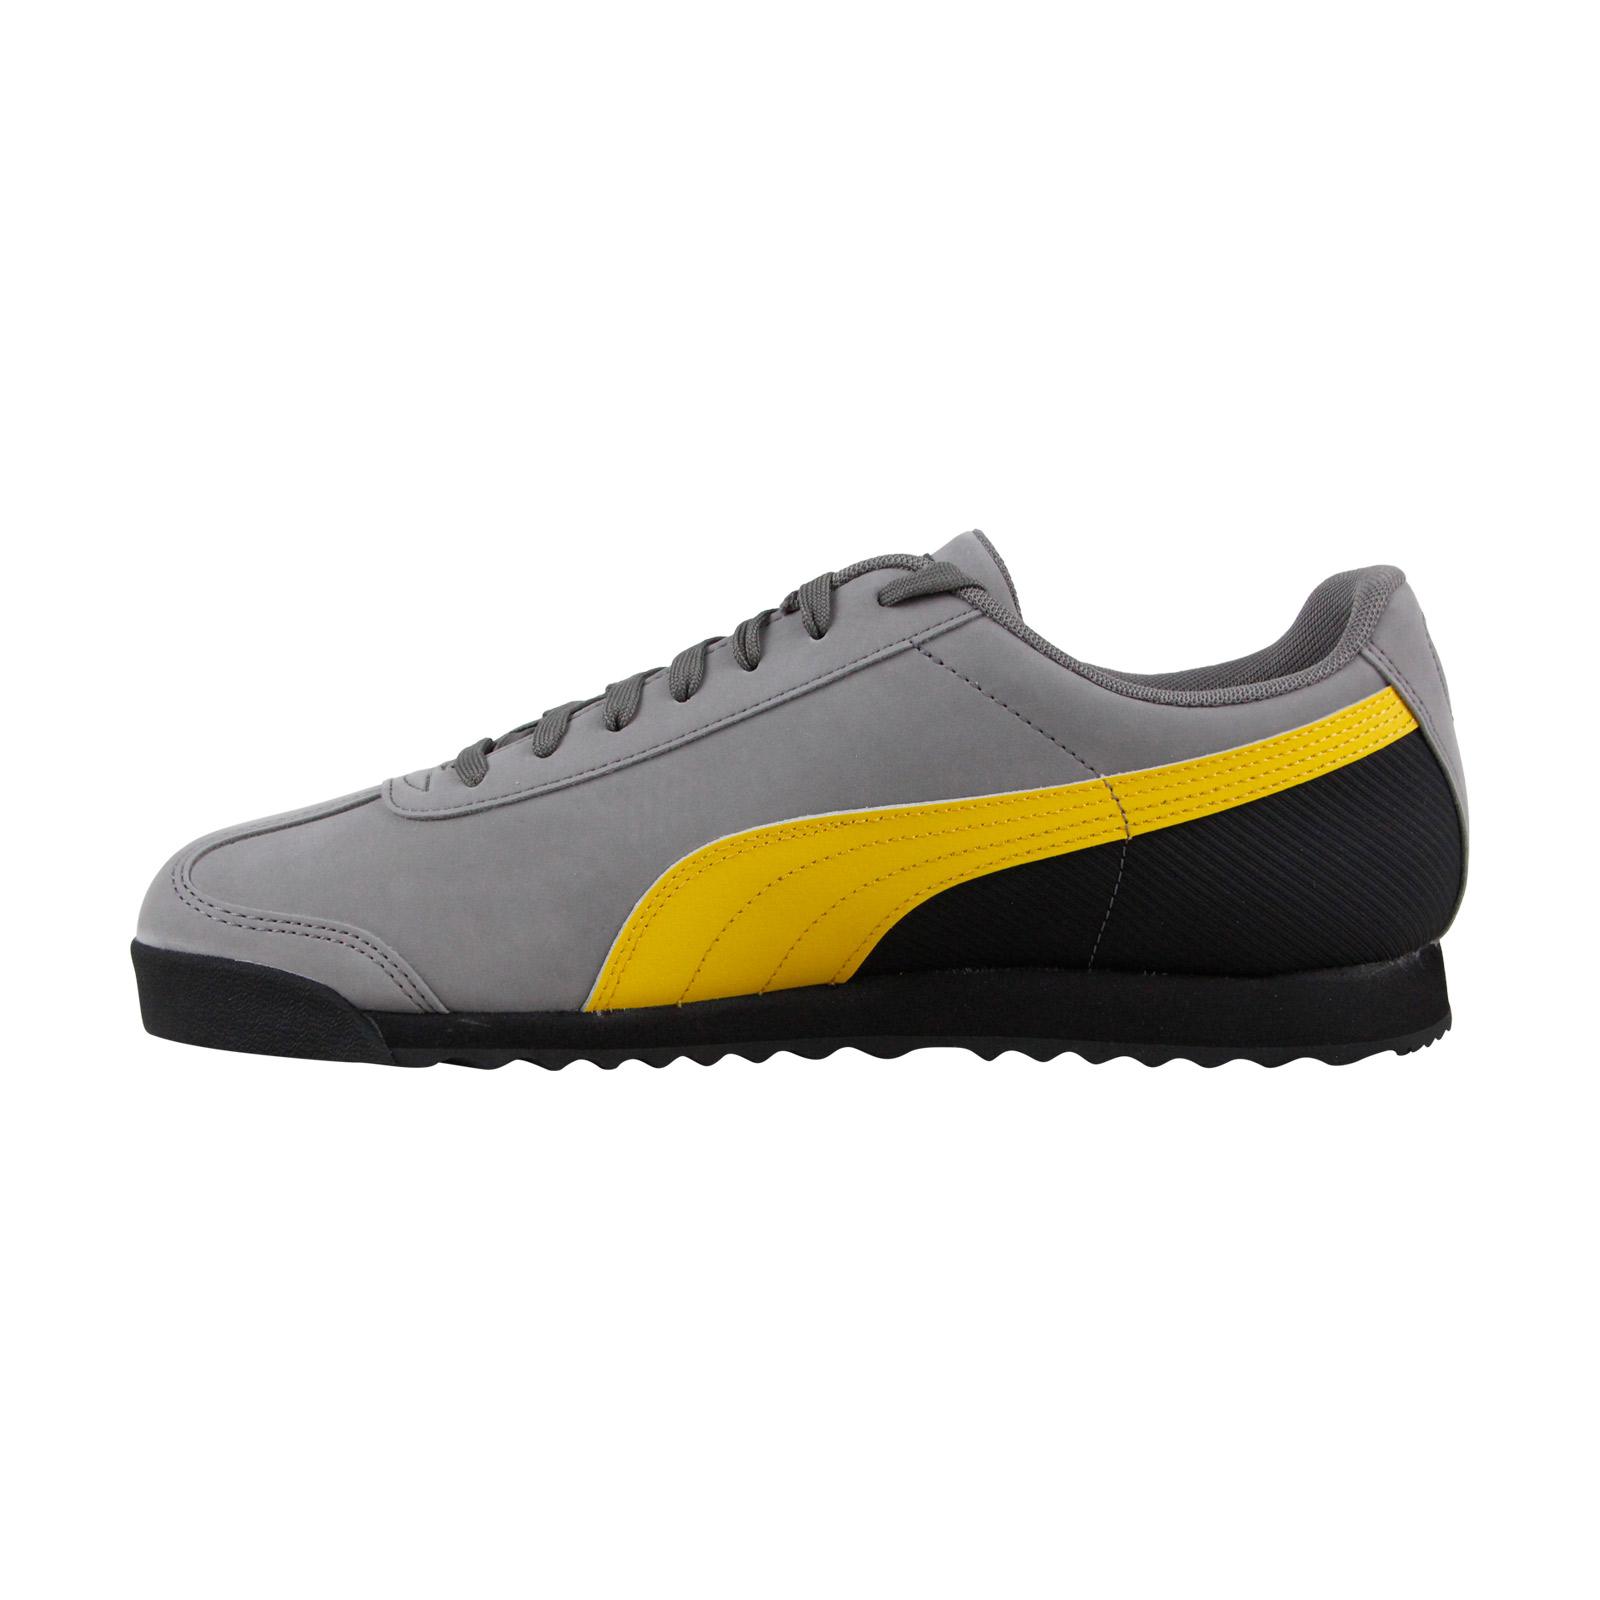 13d43c3b25 PUMA ROMA RETRO Mens Gray Nubuck Low Top Lace Up Sneakers Shoes